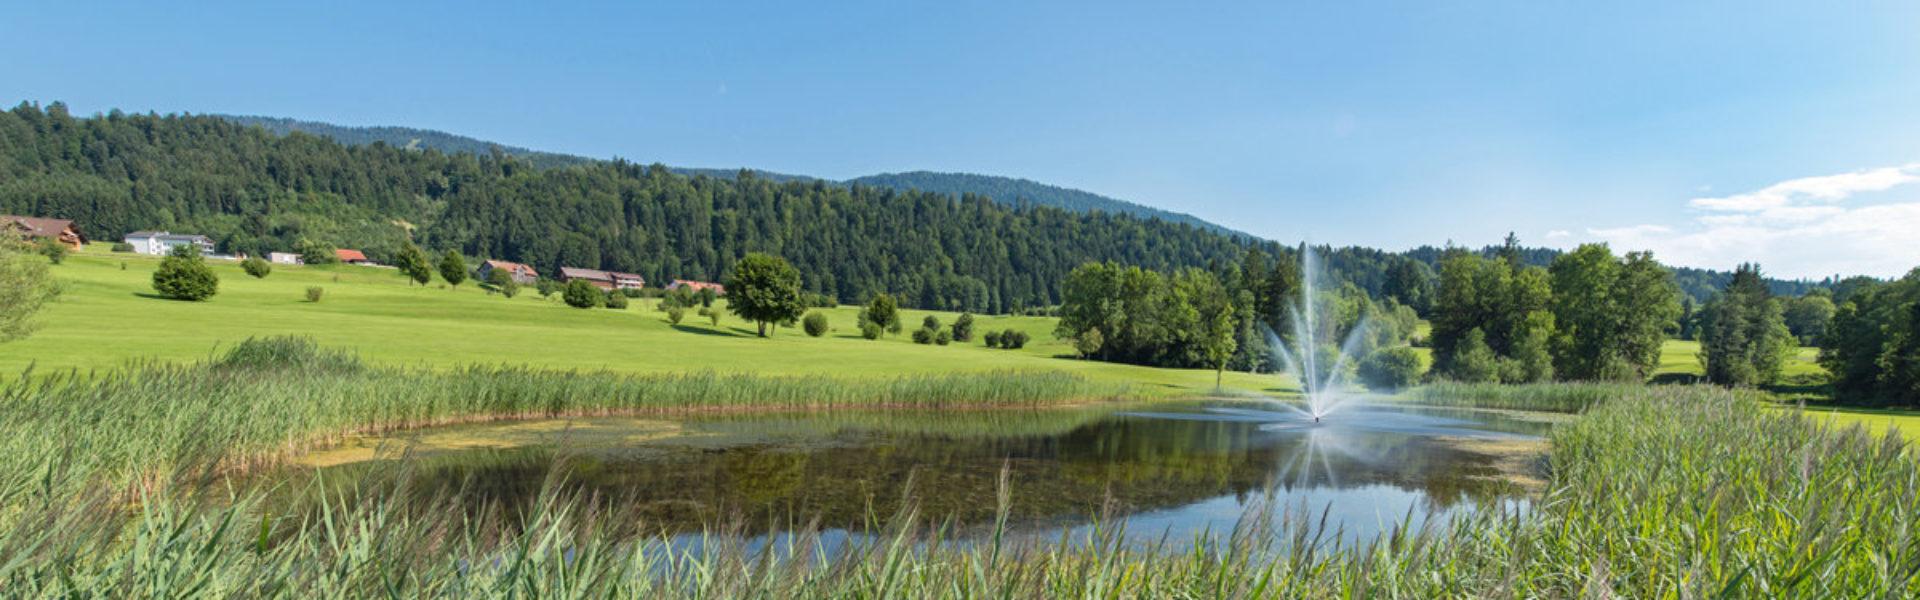 Golfpark Bregenzerwald © Golfpark Bregenzerwald